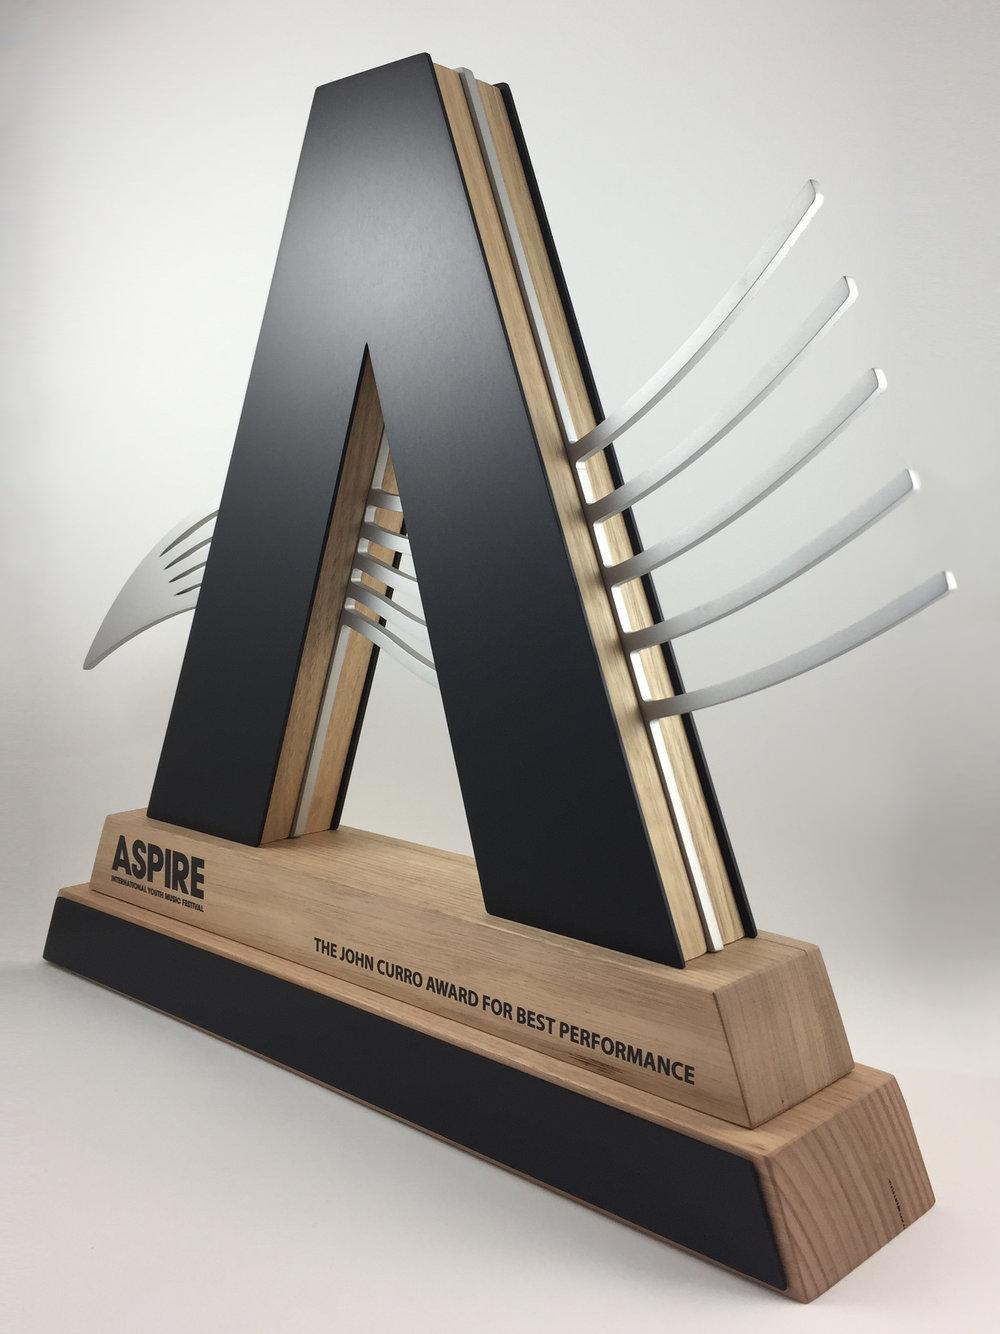 aspire-timber-metal-eco-trophy-awards-08.jpg